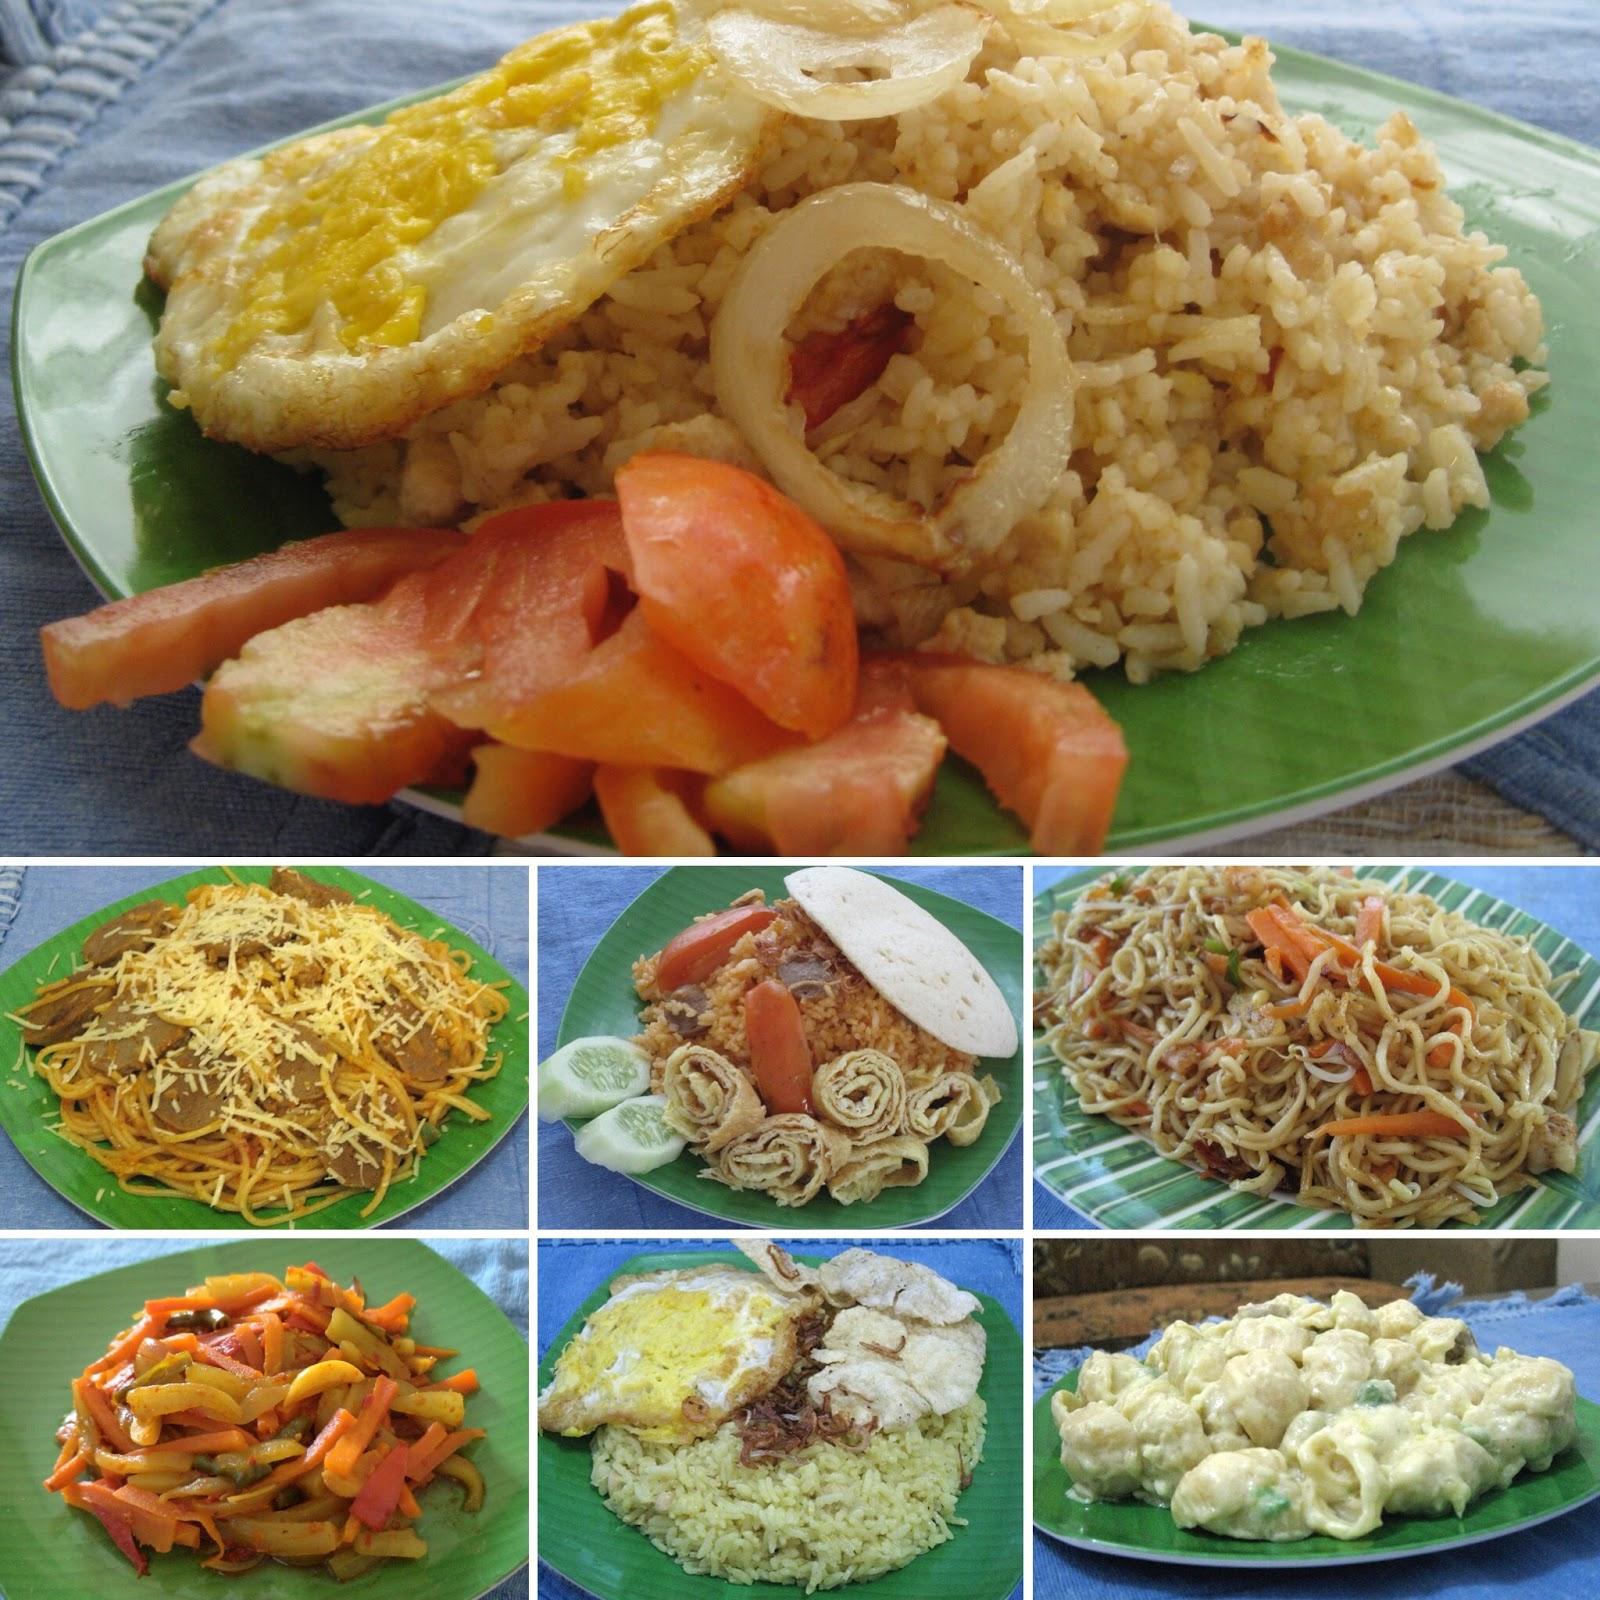 Kumpulan Resep Makanan Khas Resep Makanan Sehat Untuk Anak Tk